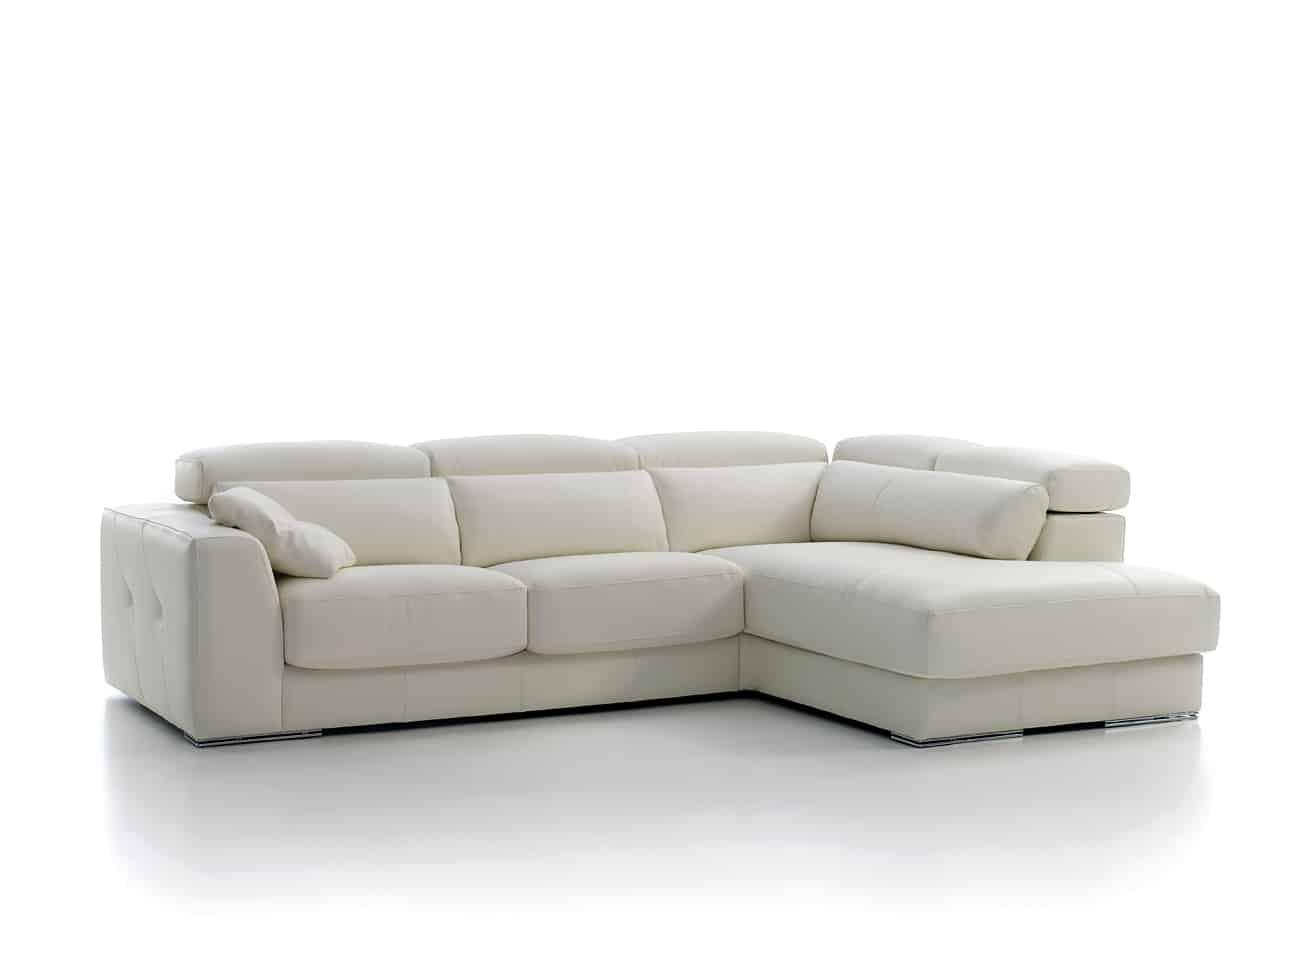 Sofas yecla pedro ortiz chaise longue terminal roma pedro ortz chaise longue roma deslizante - Sofas pedro ortiz opiniones ...